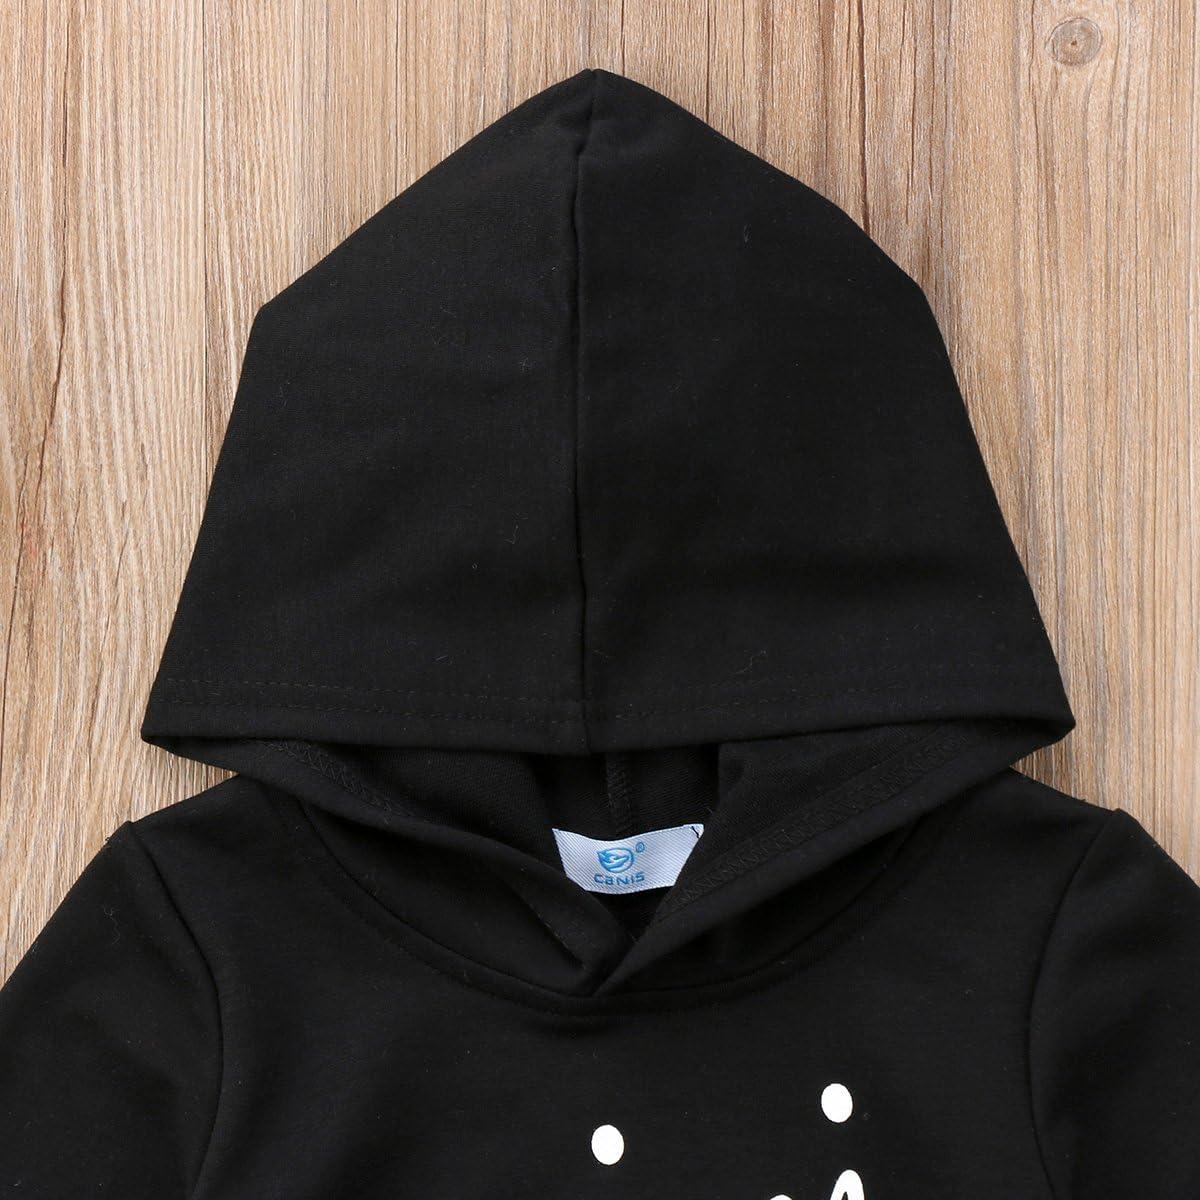 Kids Baby Girls Little Girls Boys Mini Boss Hoodie Sweatshirt Long Sleeve Casual Hooded Tops